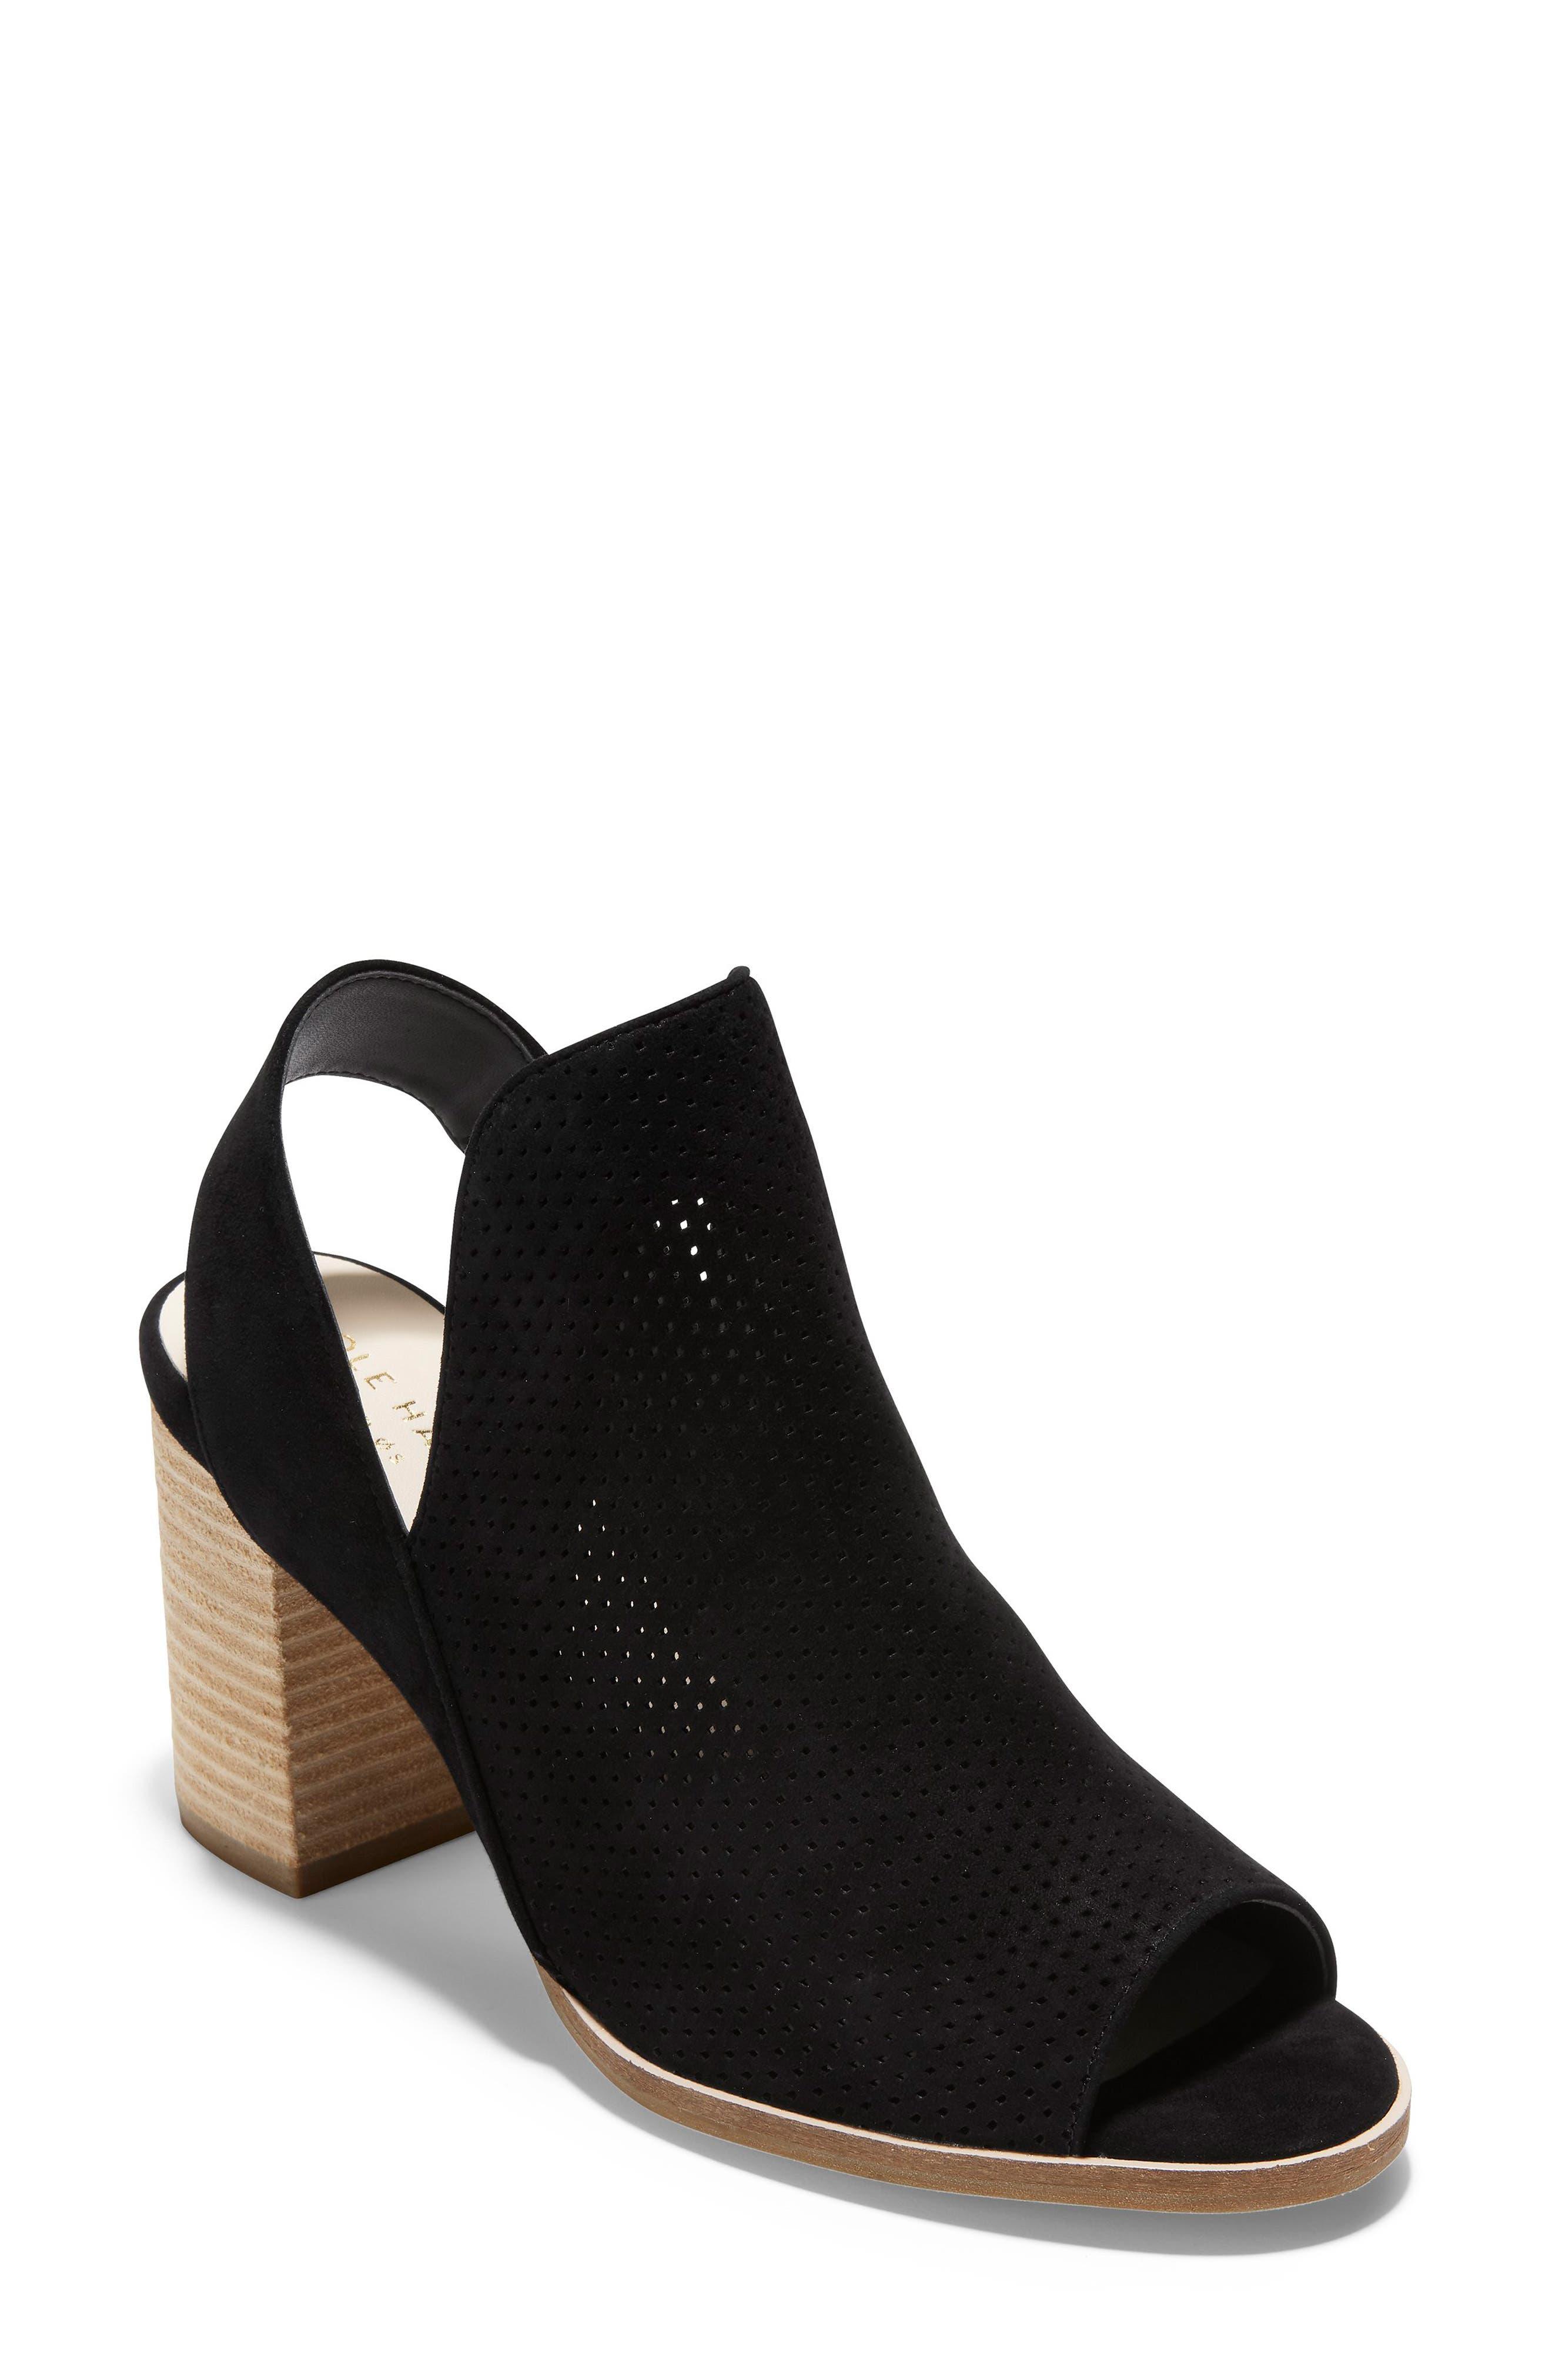 Callista Perforated Slingback Sandal,                             Main thumbnail 1, color,                             BLACK PERF SUEDE